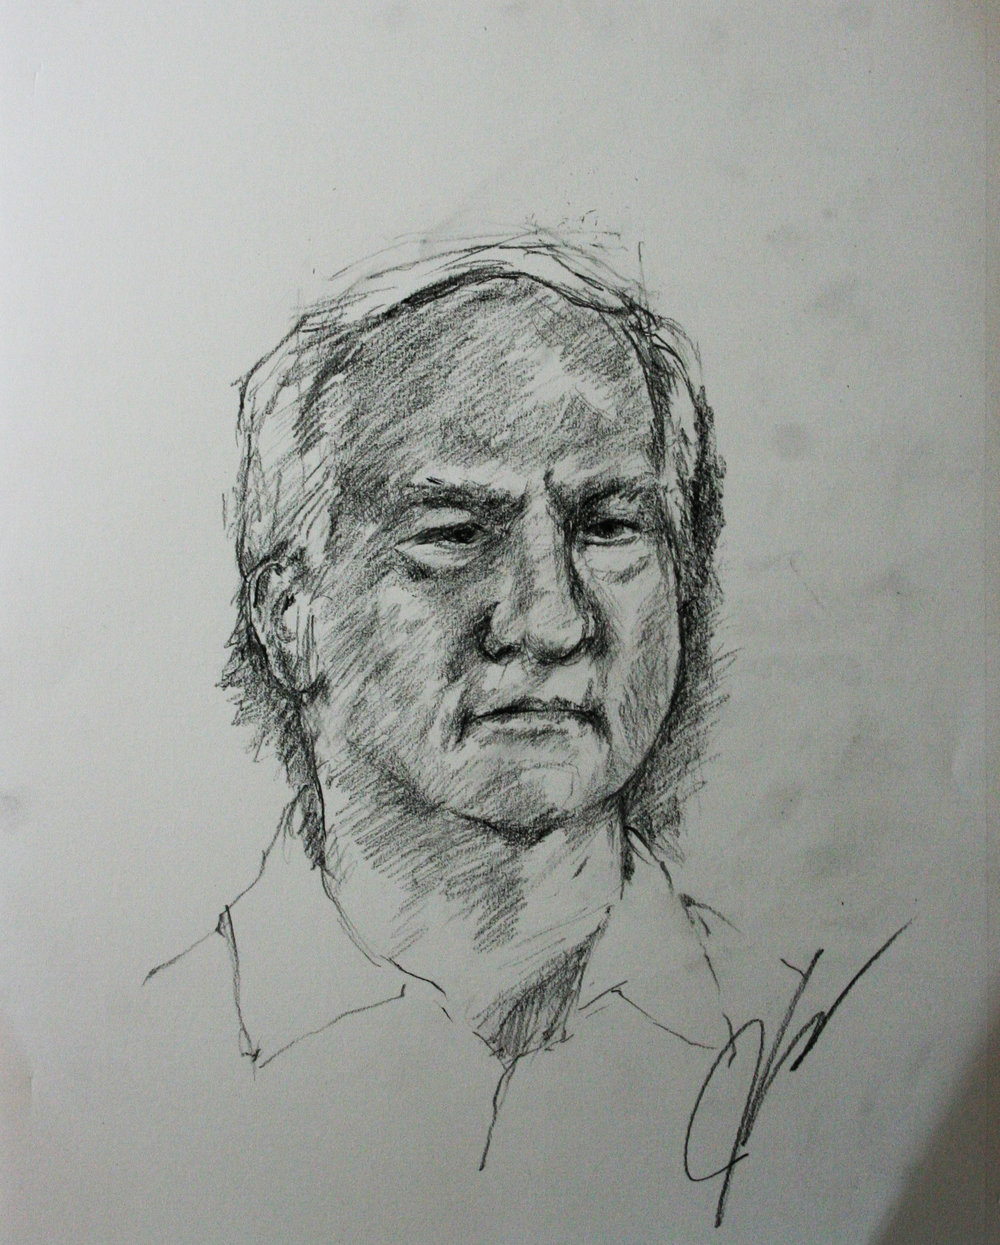 John Hauser did this 45 minute drawing.